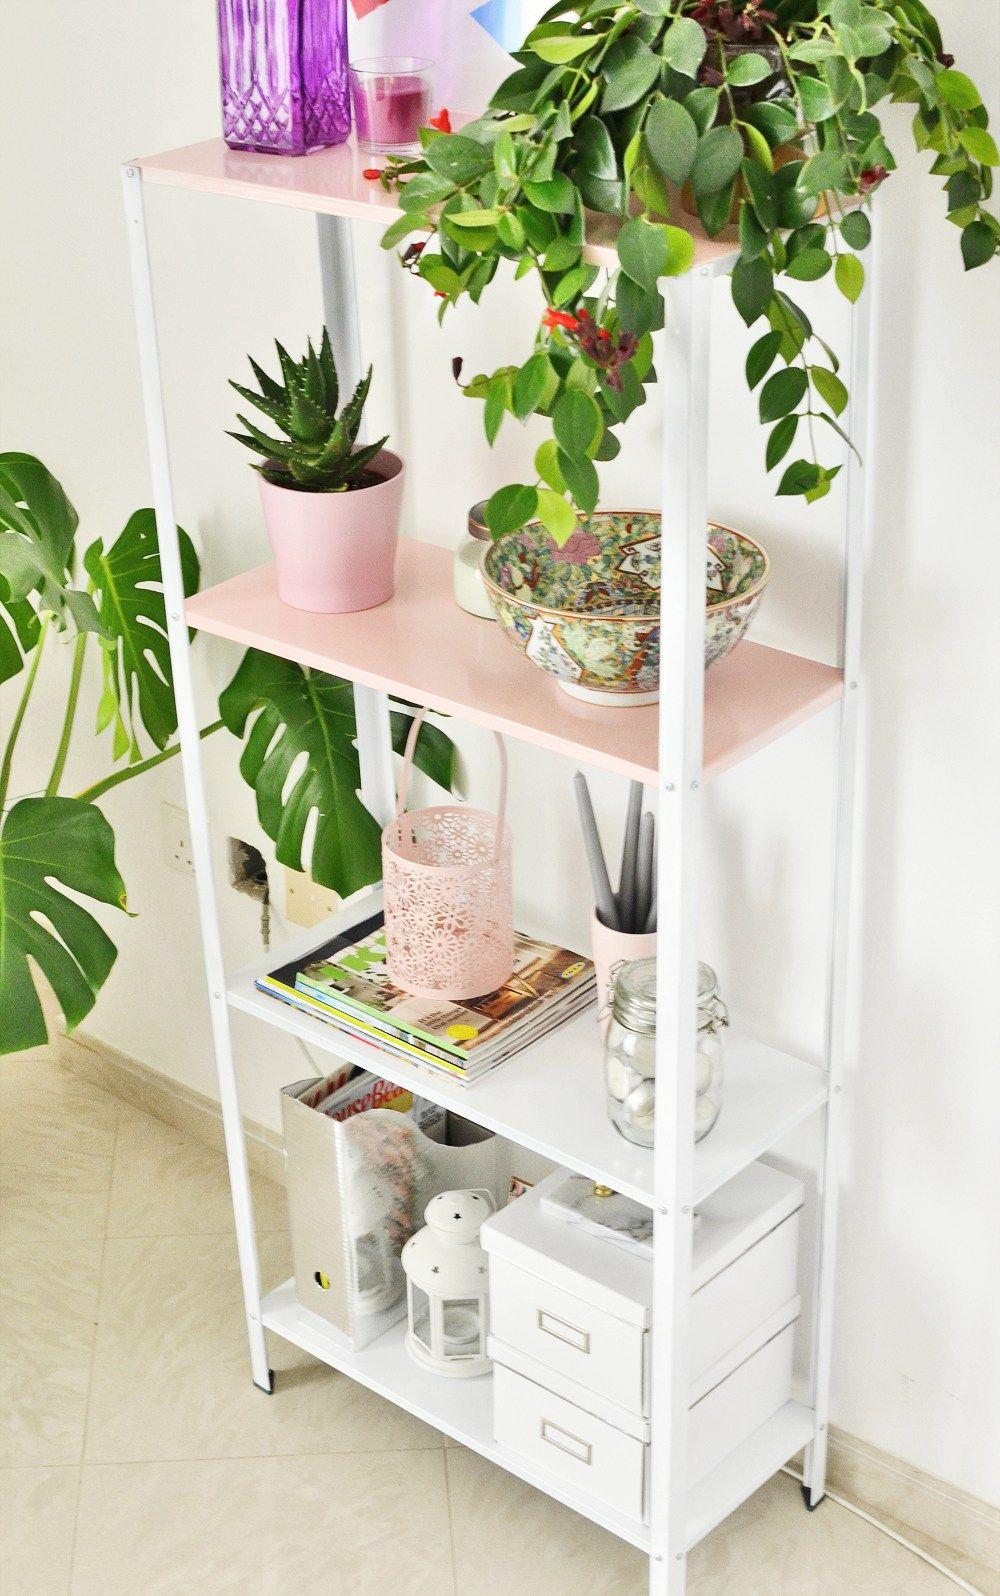 IKEA Hack: DIY Half Pink Shelf